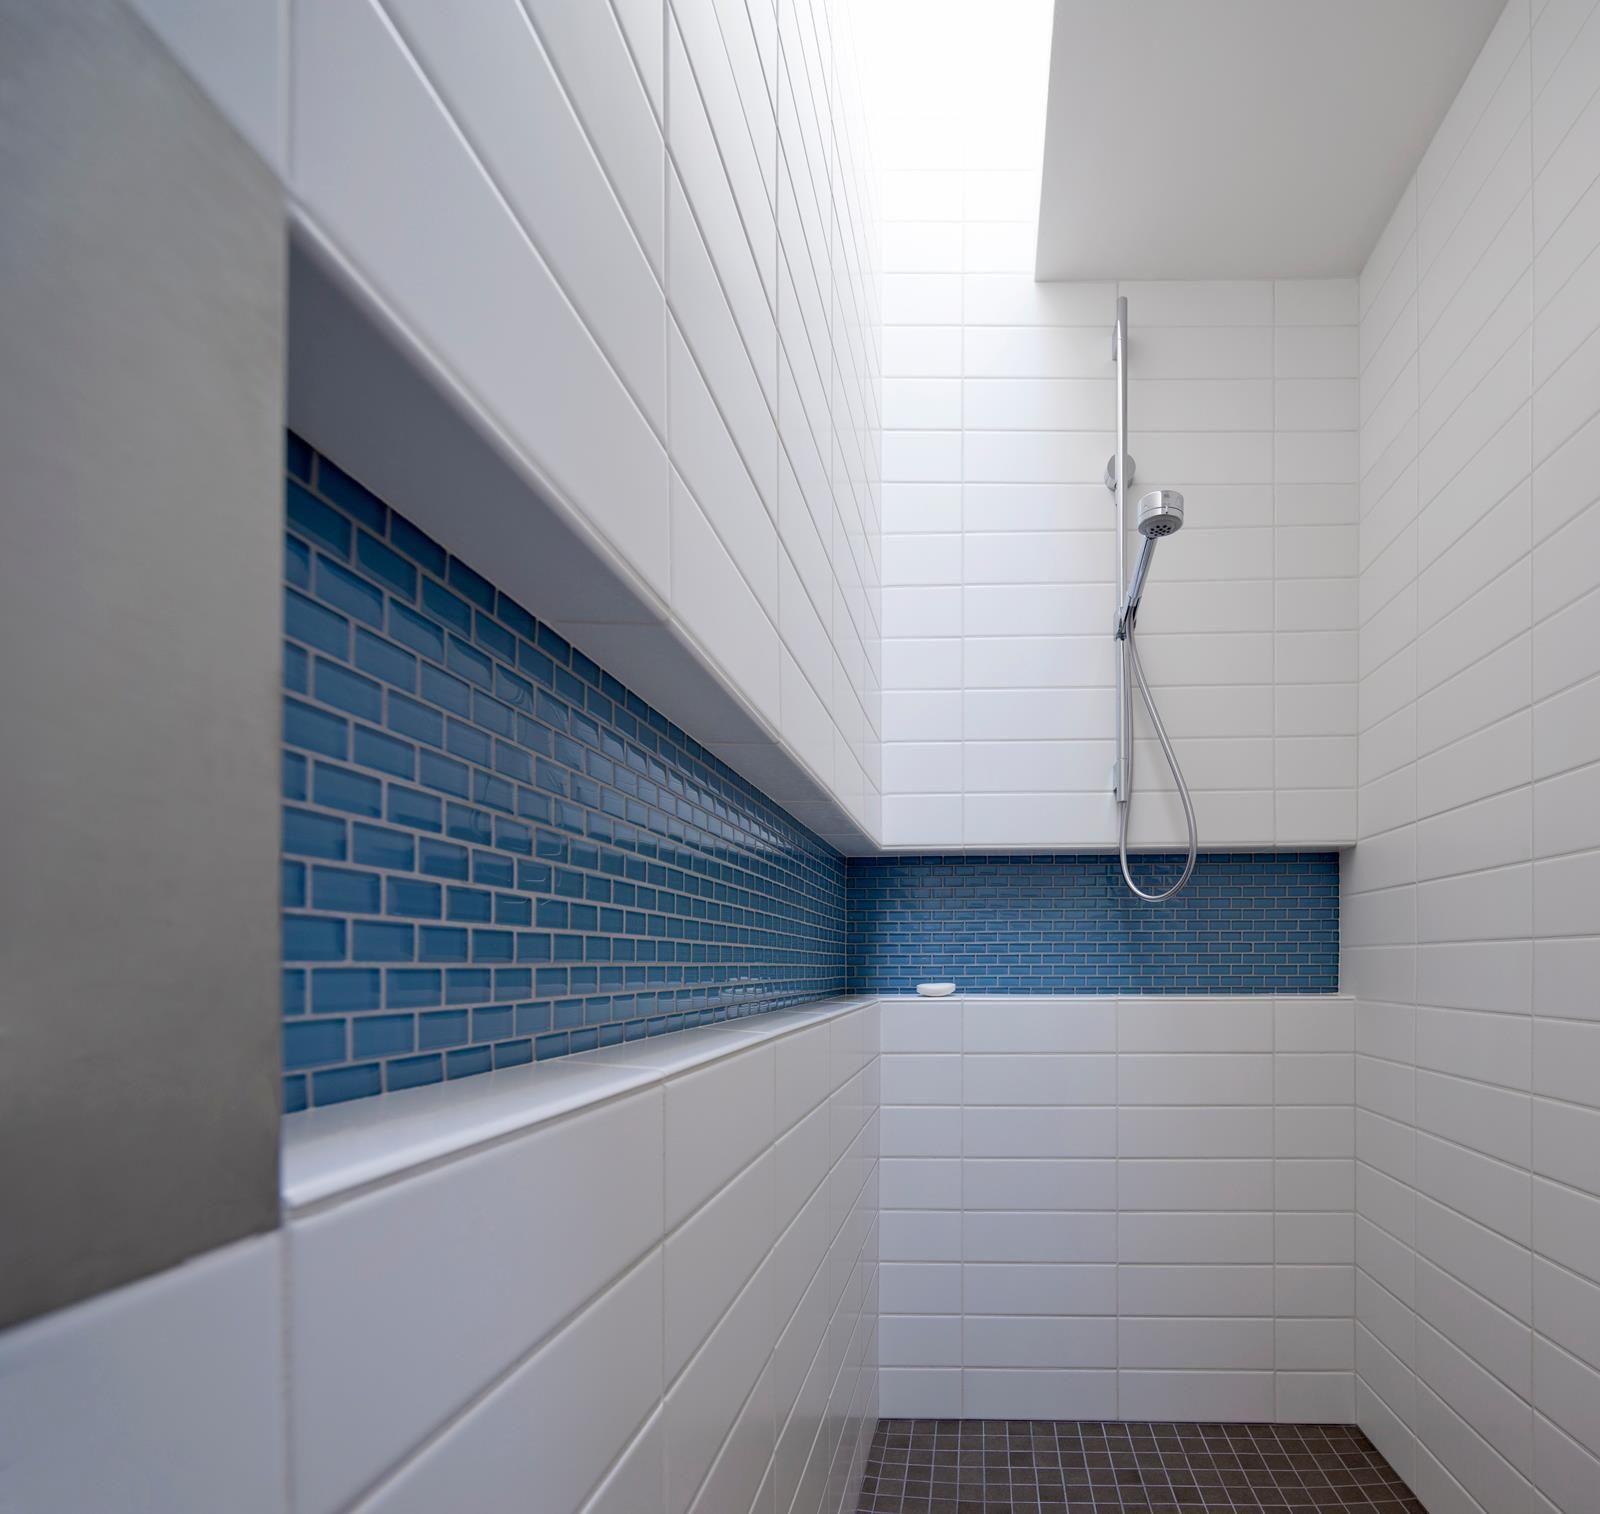 Polish Bathroom Tile: Clean Modern Shower